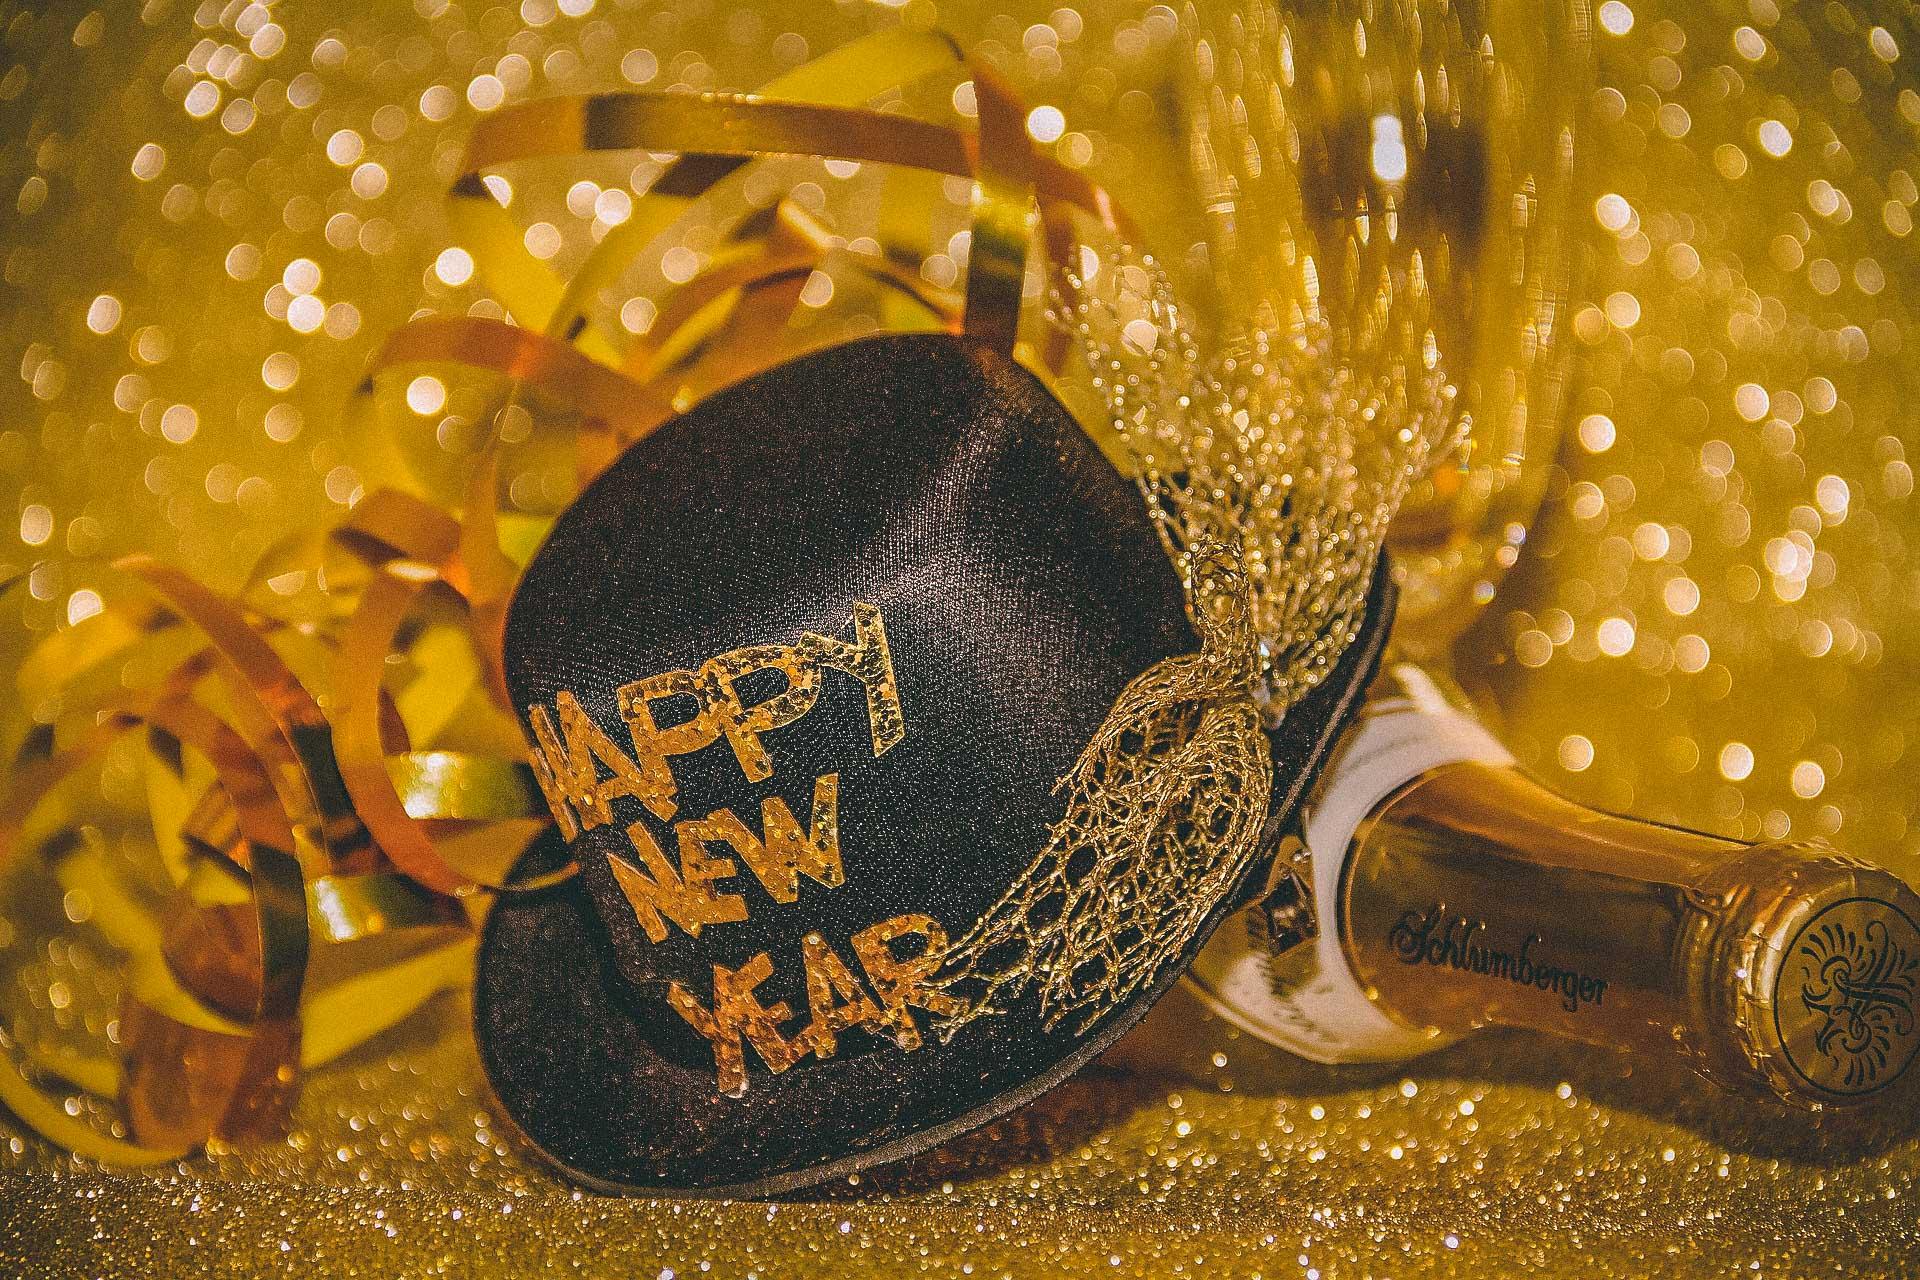 Hagymatikum New Year's Party